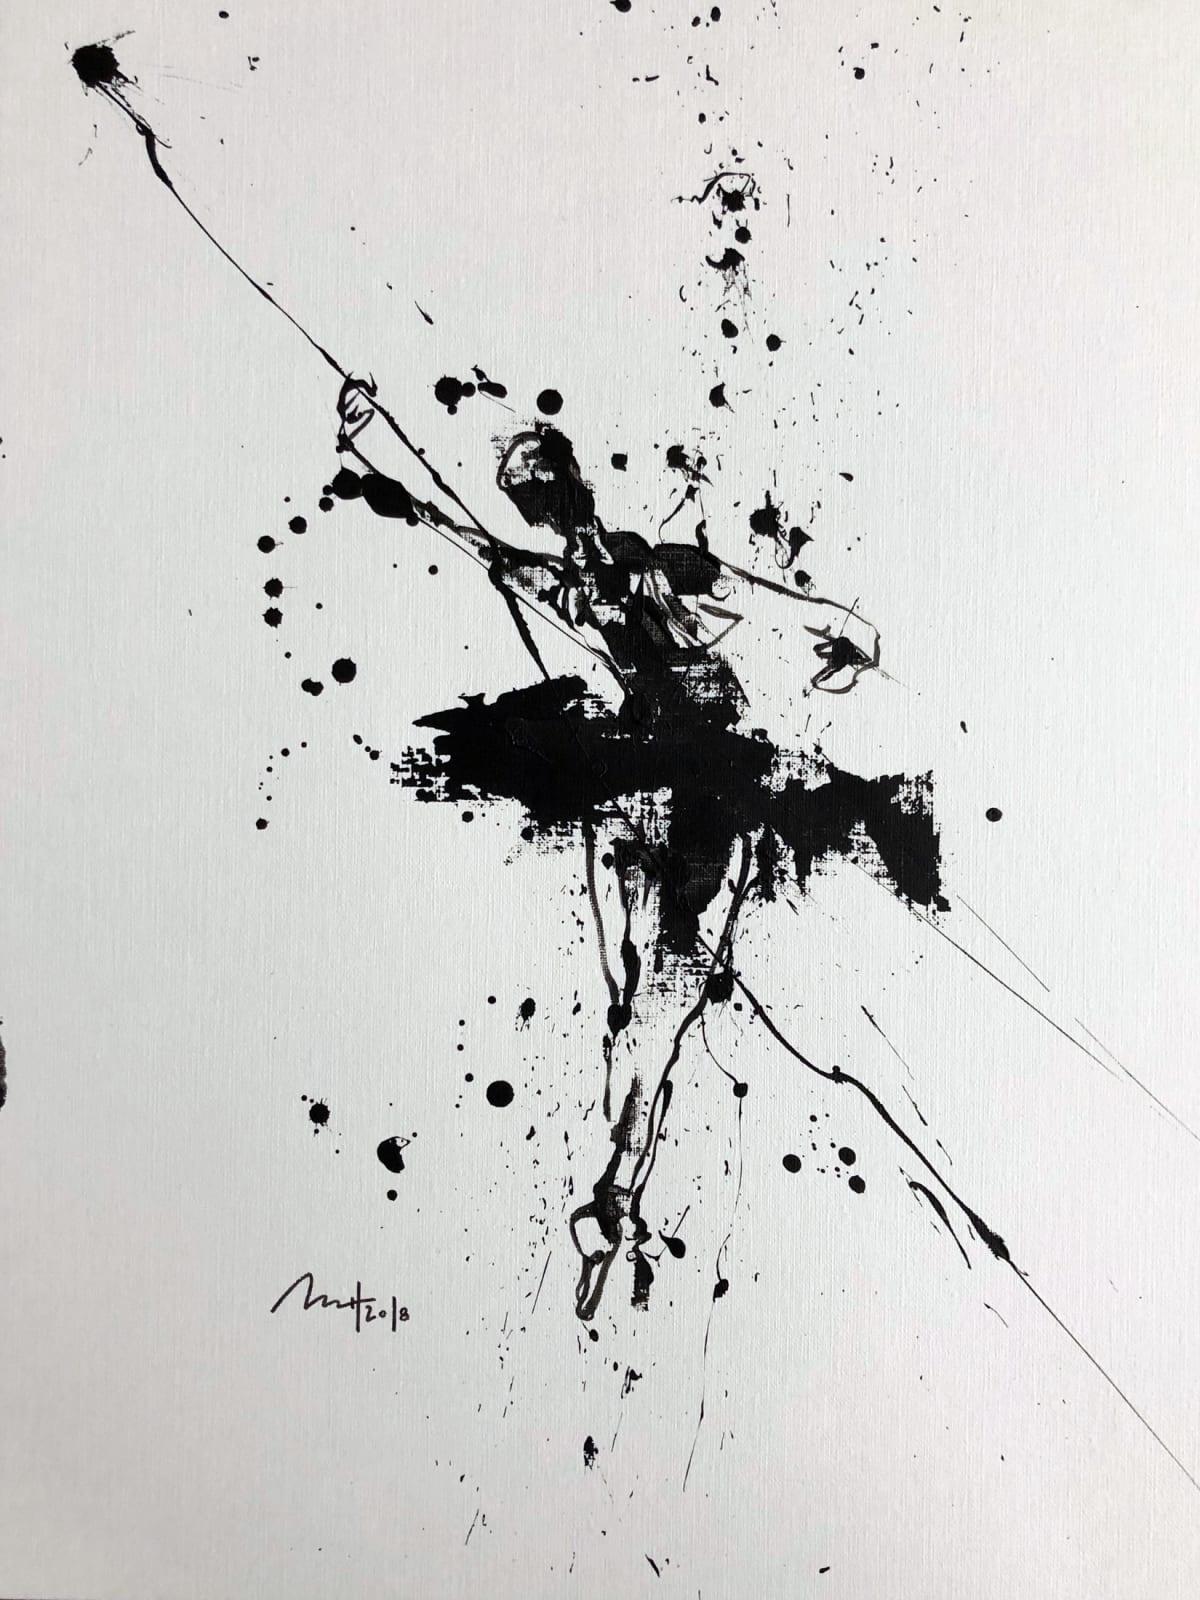 Mario Henrique, Ballerina No. 14, 2018